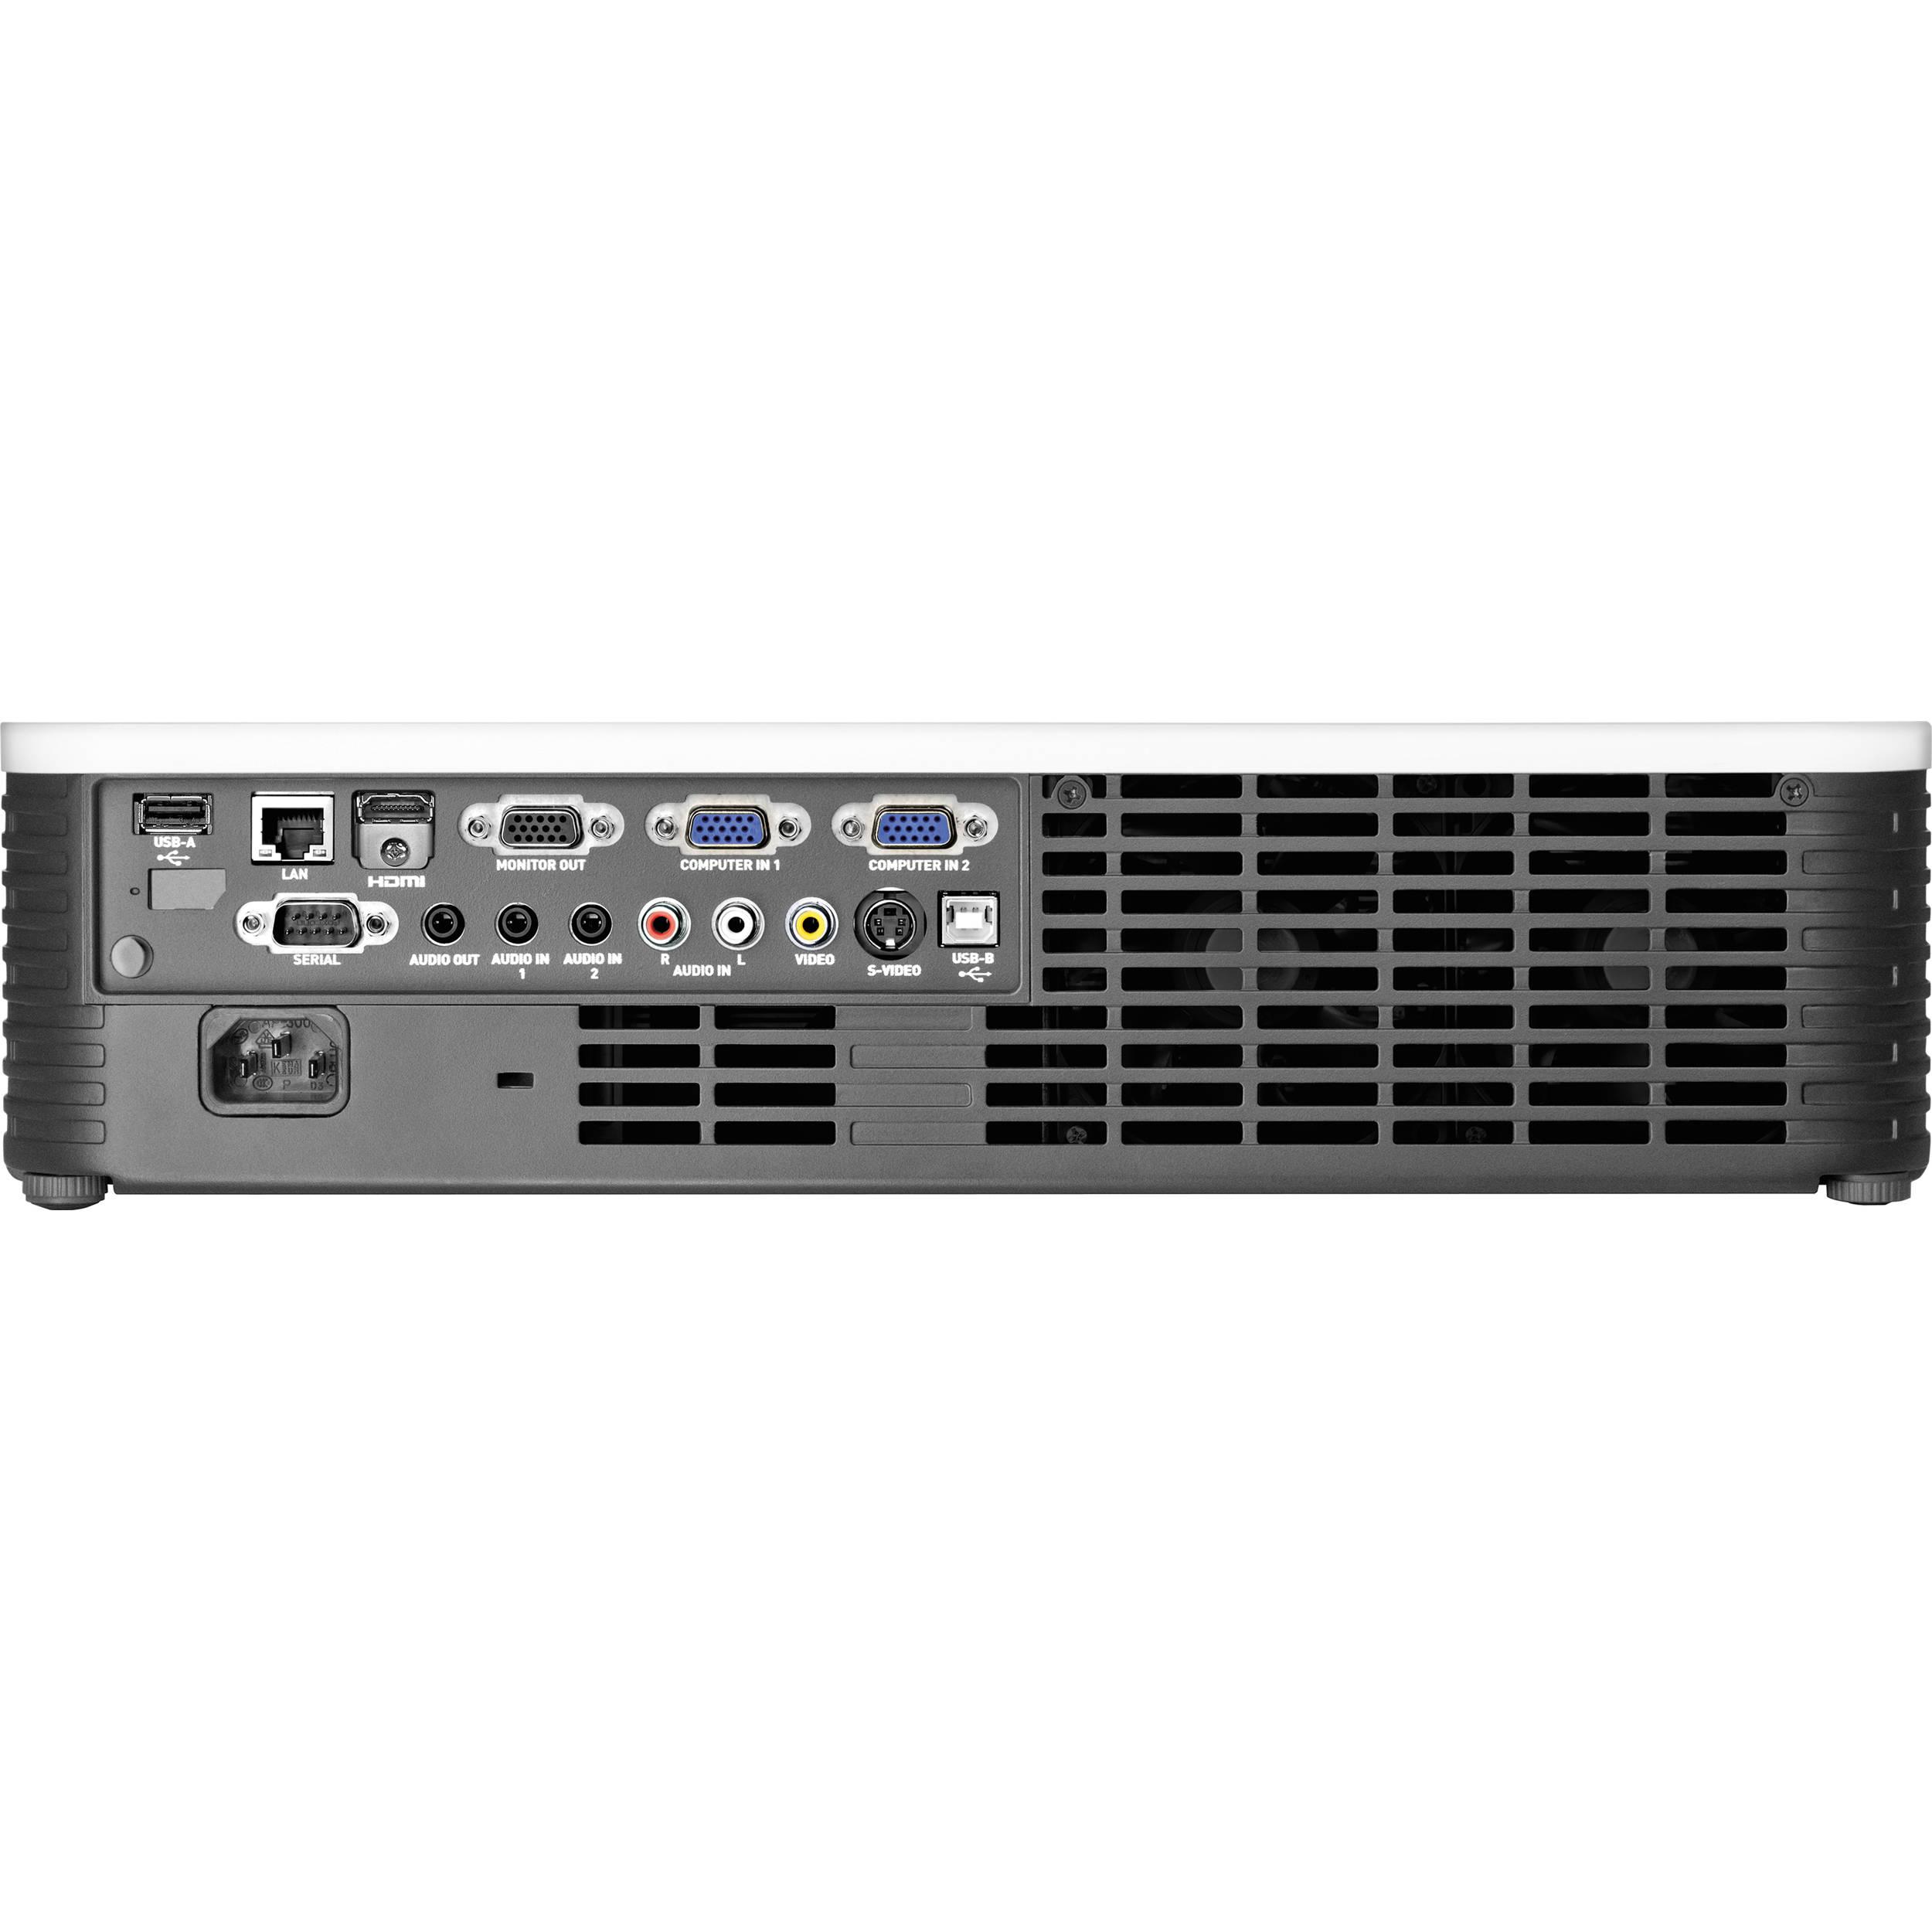 Casio XJ-H1650 3D Pro Model Projector XJ-H1650 B&H Photo Video